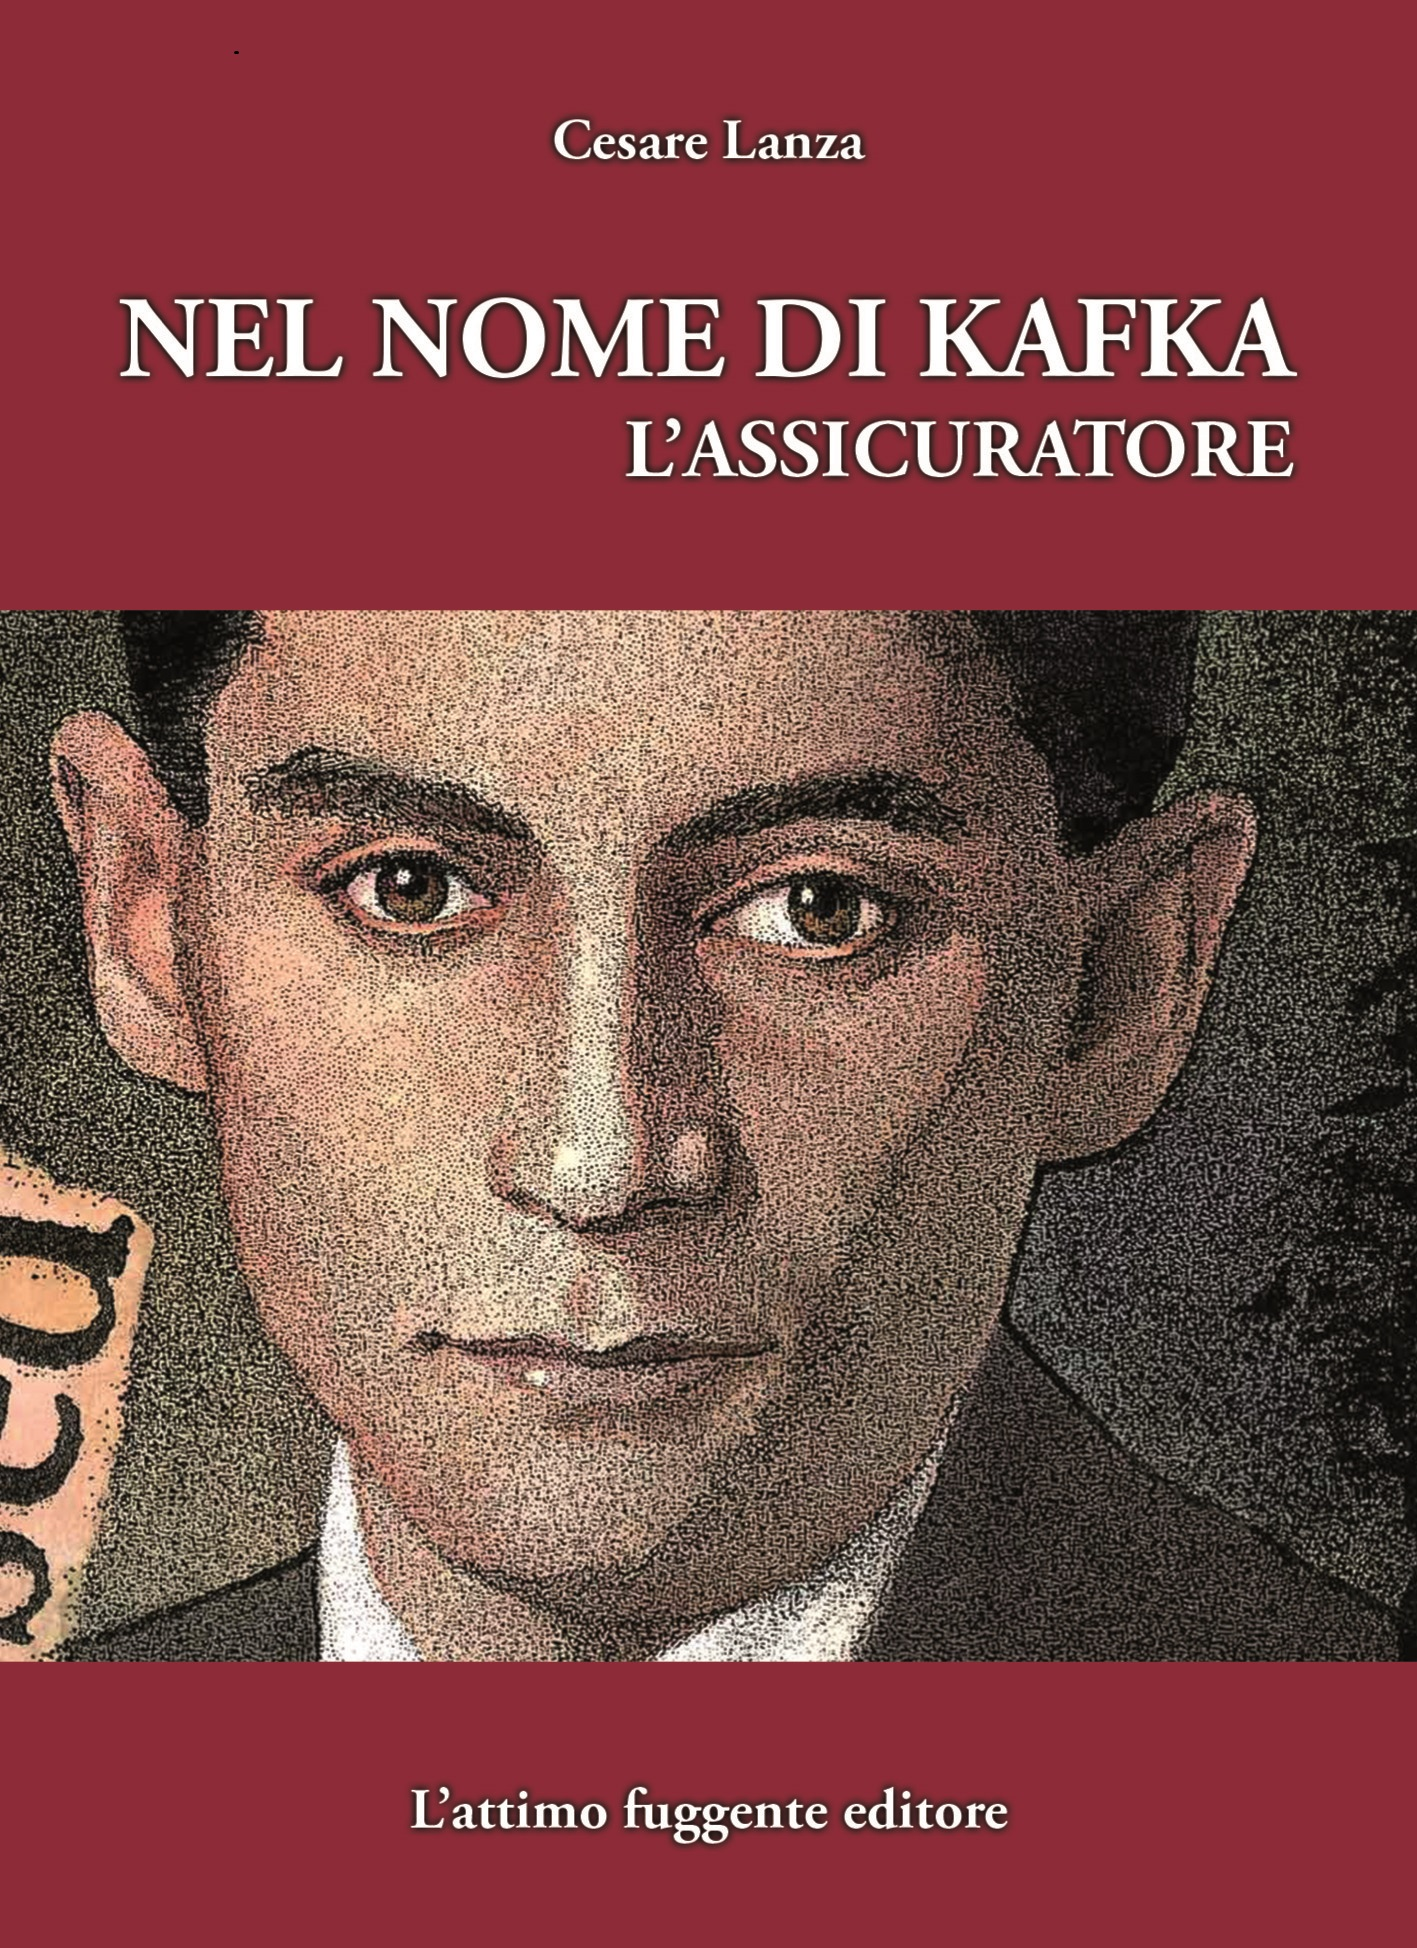 Copertina_Kafka